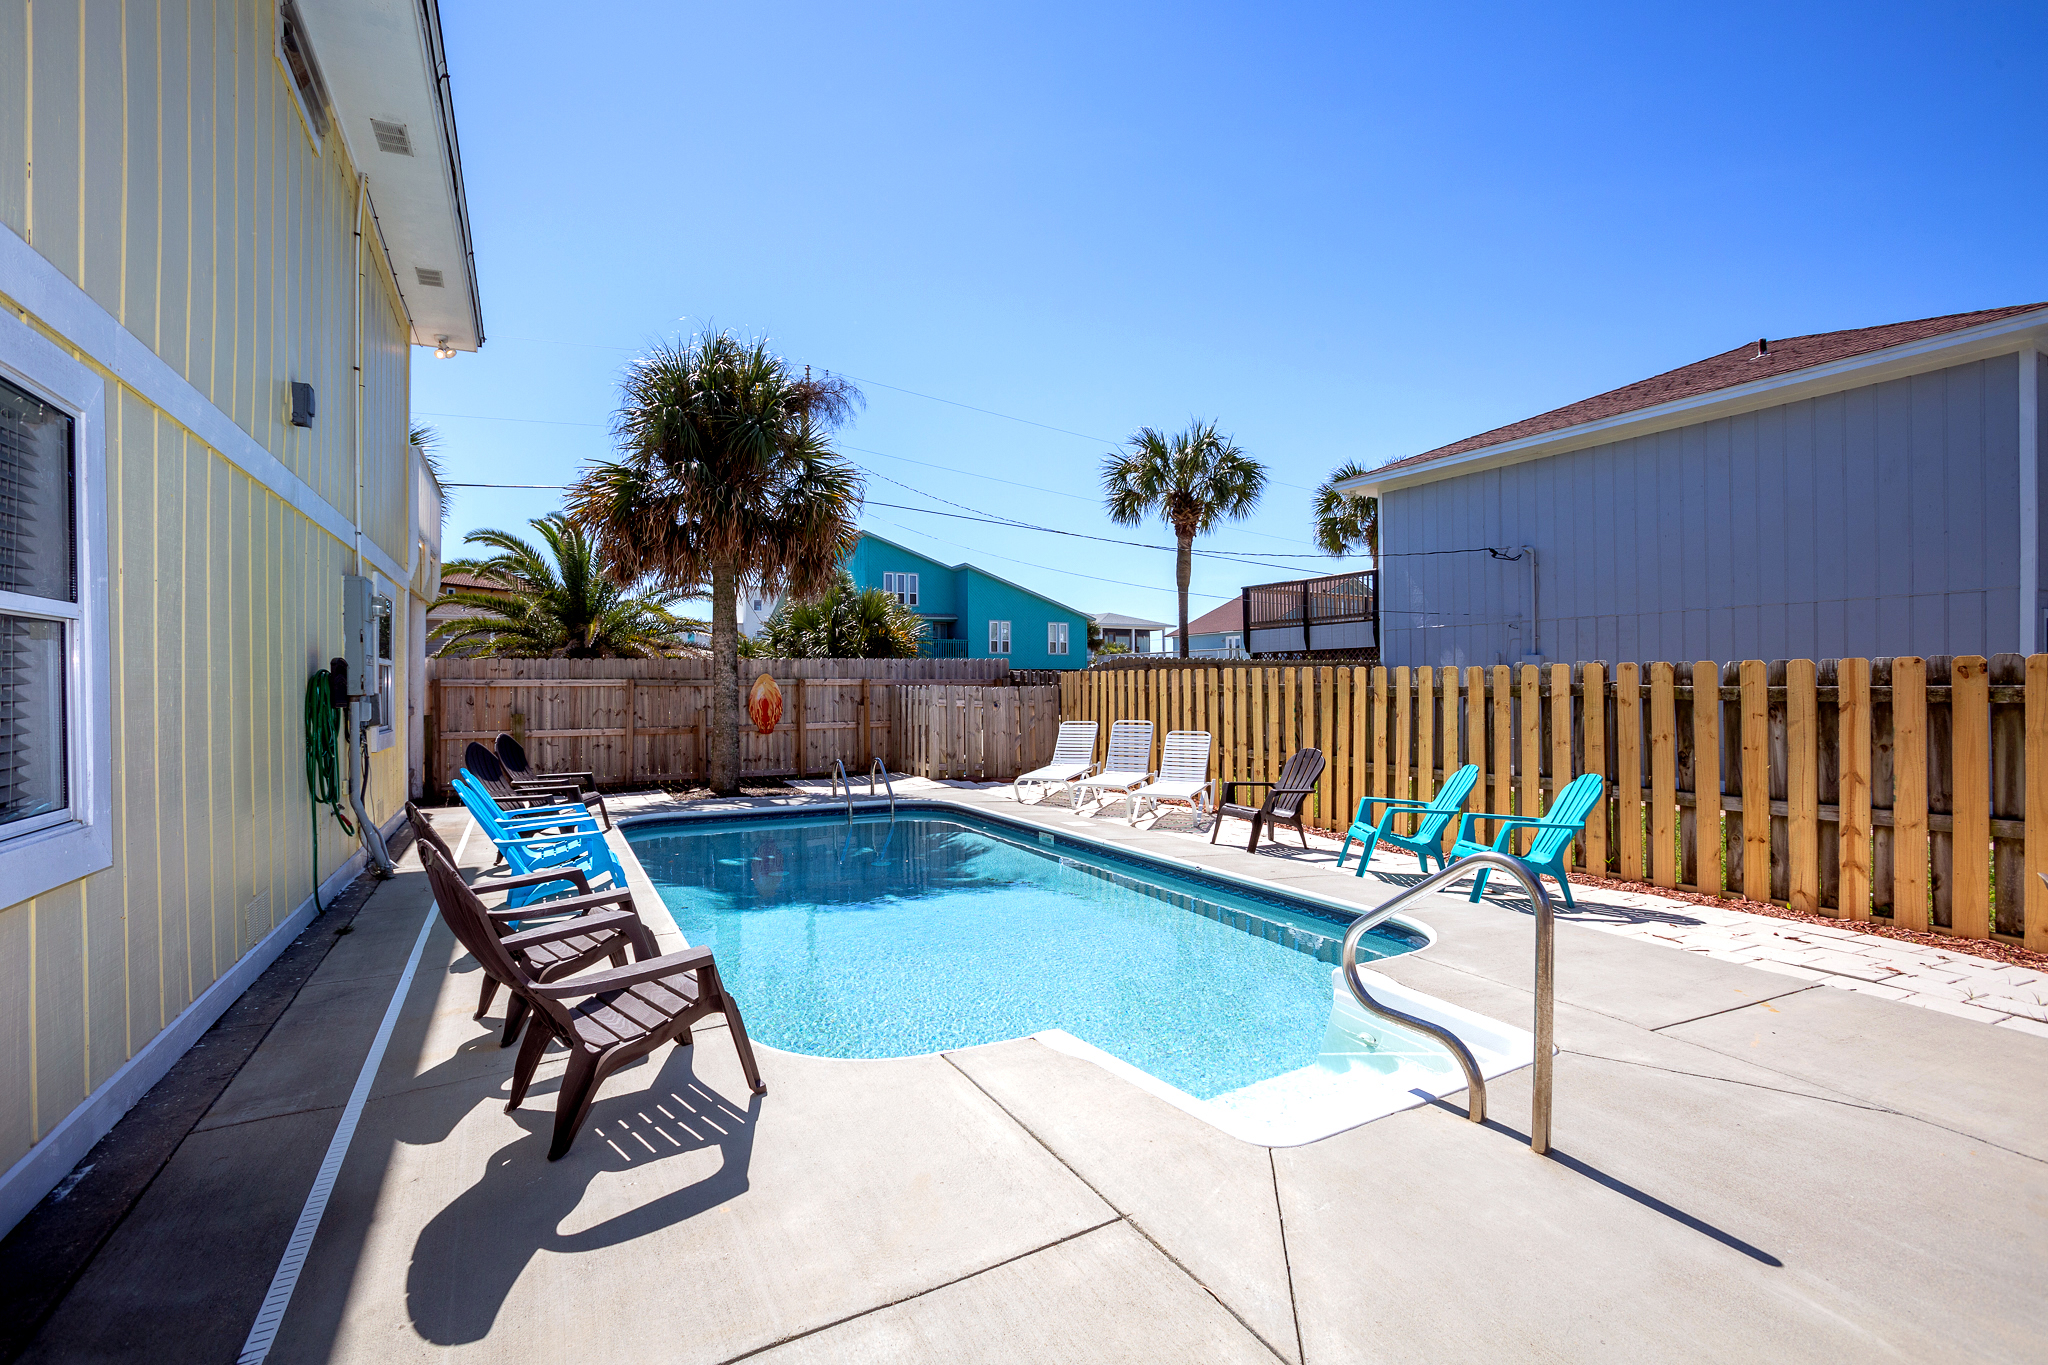 Maldonado 1015 - Sea the Big Picture House/Cottage rental in Pensacola Beach House Rentals in Pensacola Beach Florida - #43